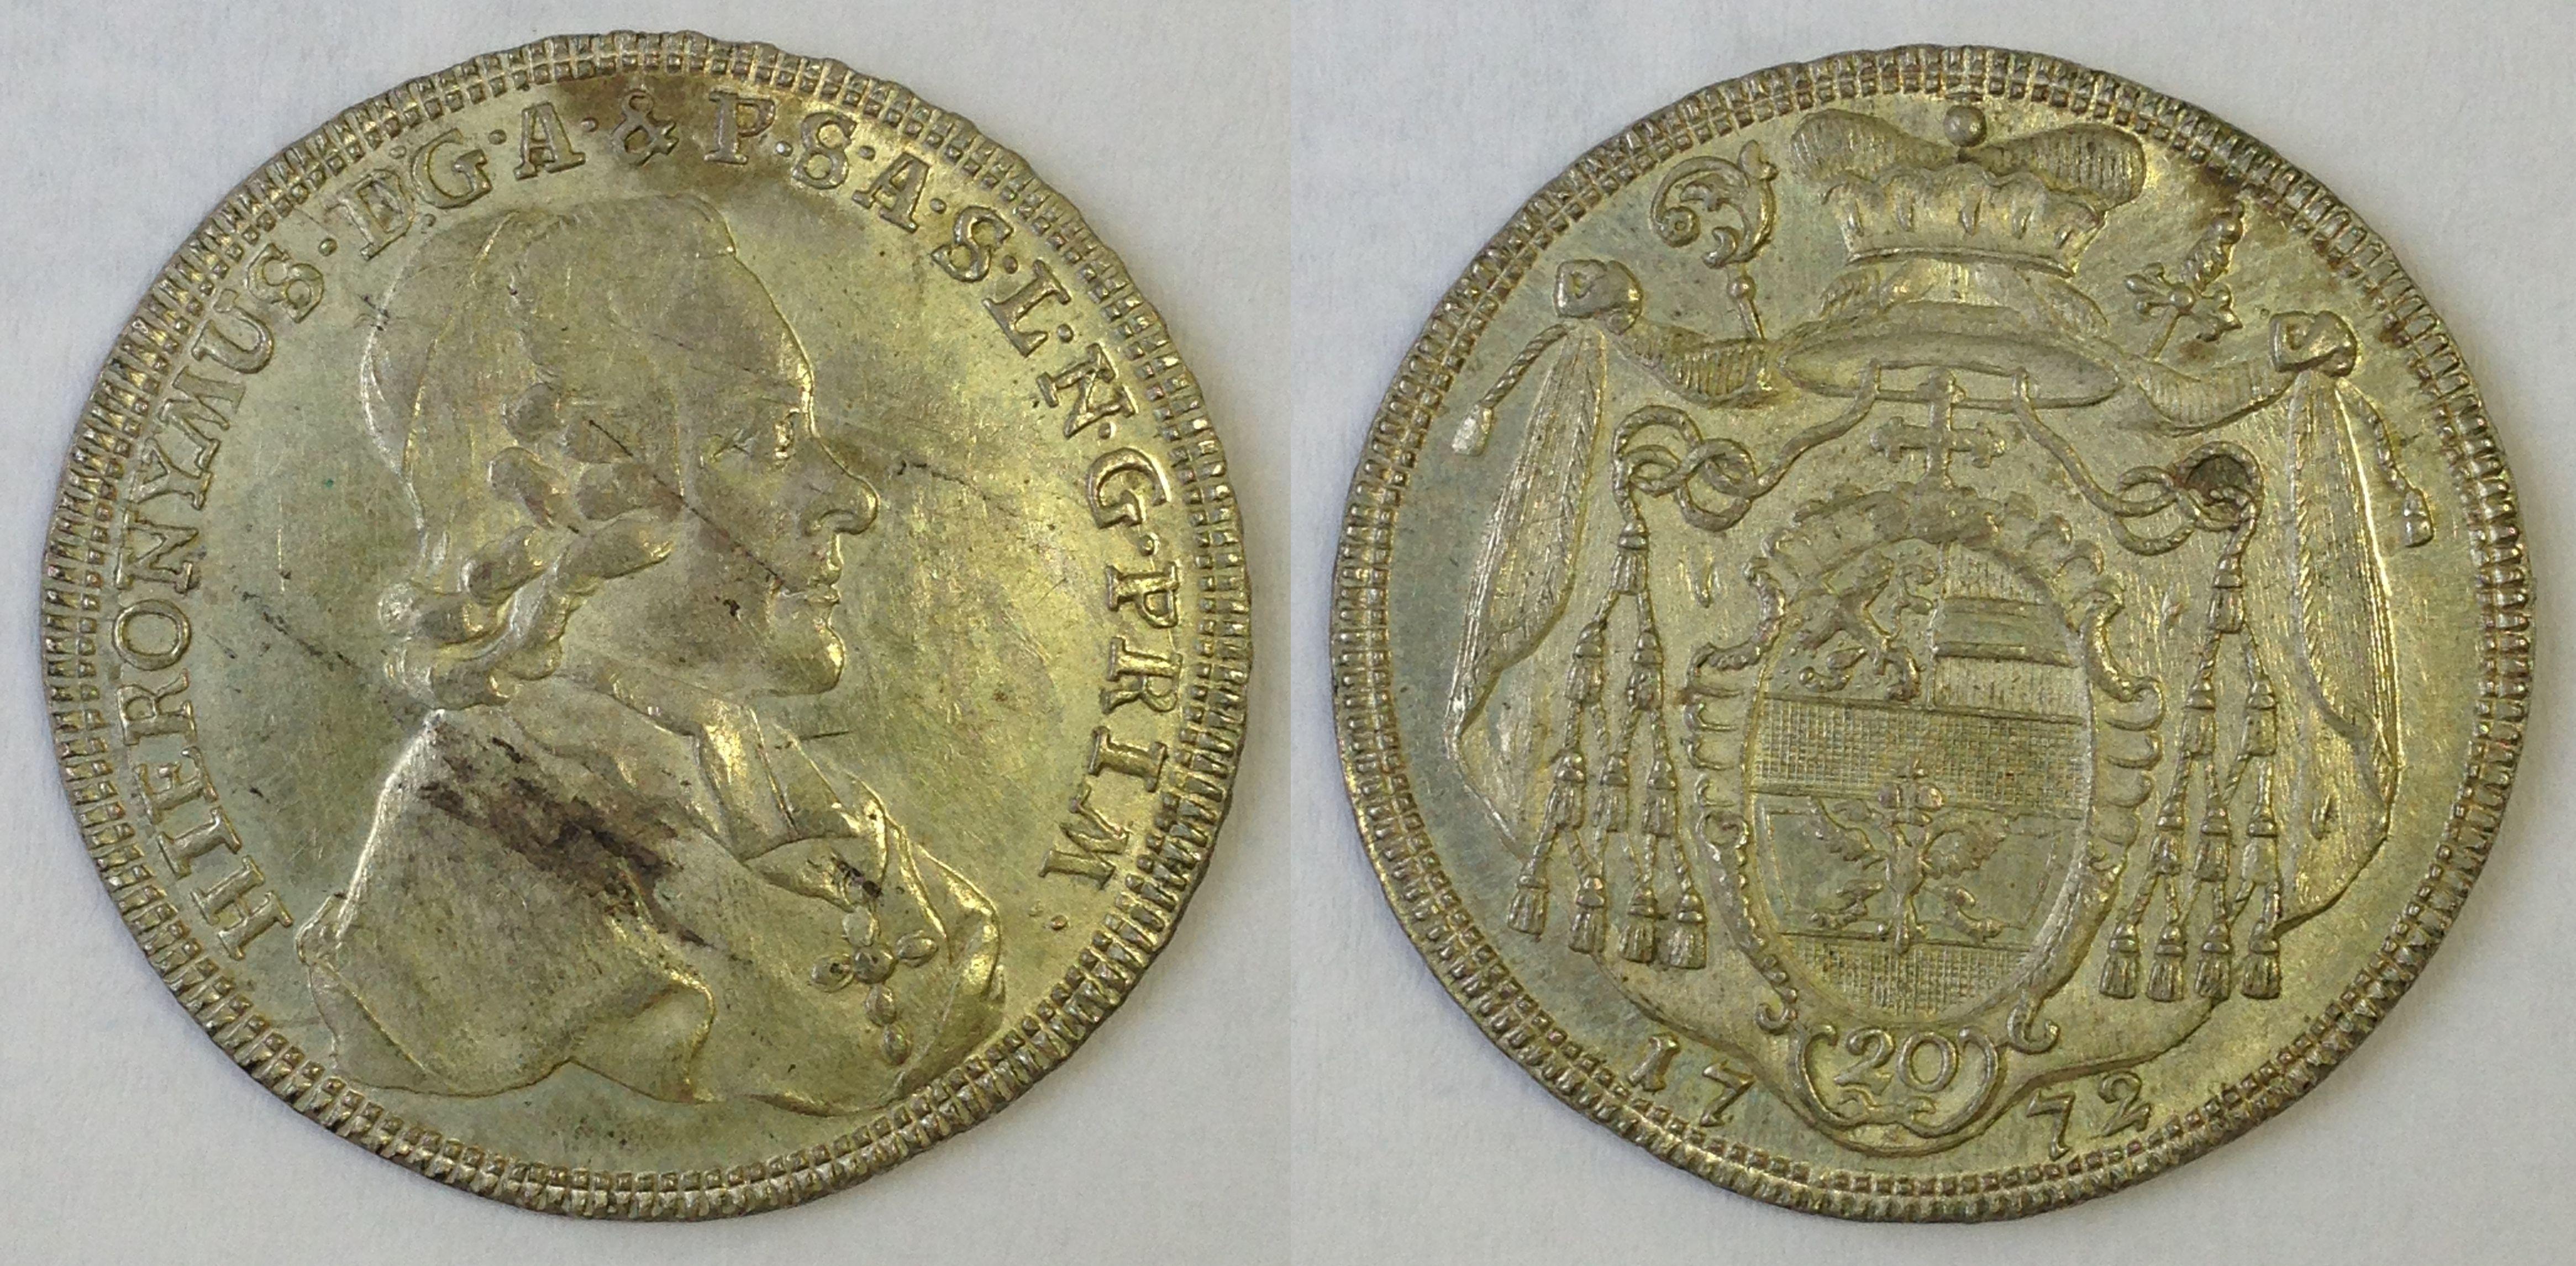 20 Kreuzer 1772, Münzkabinett Prag